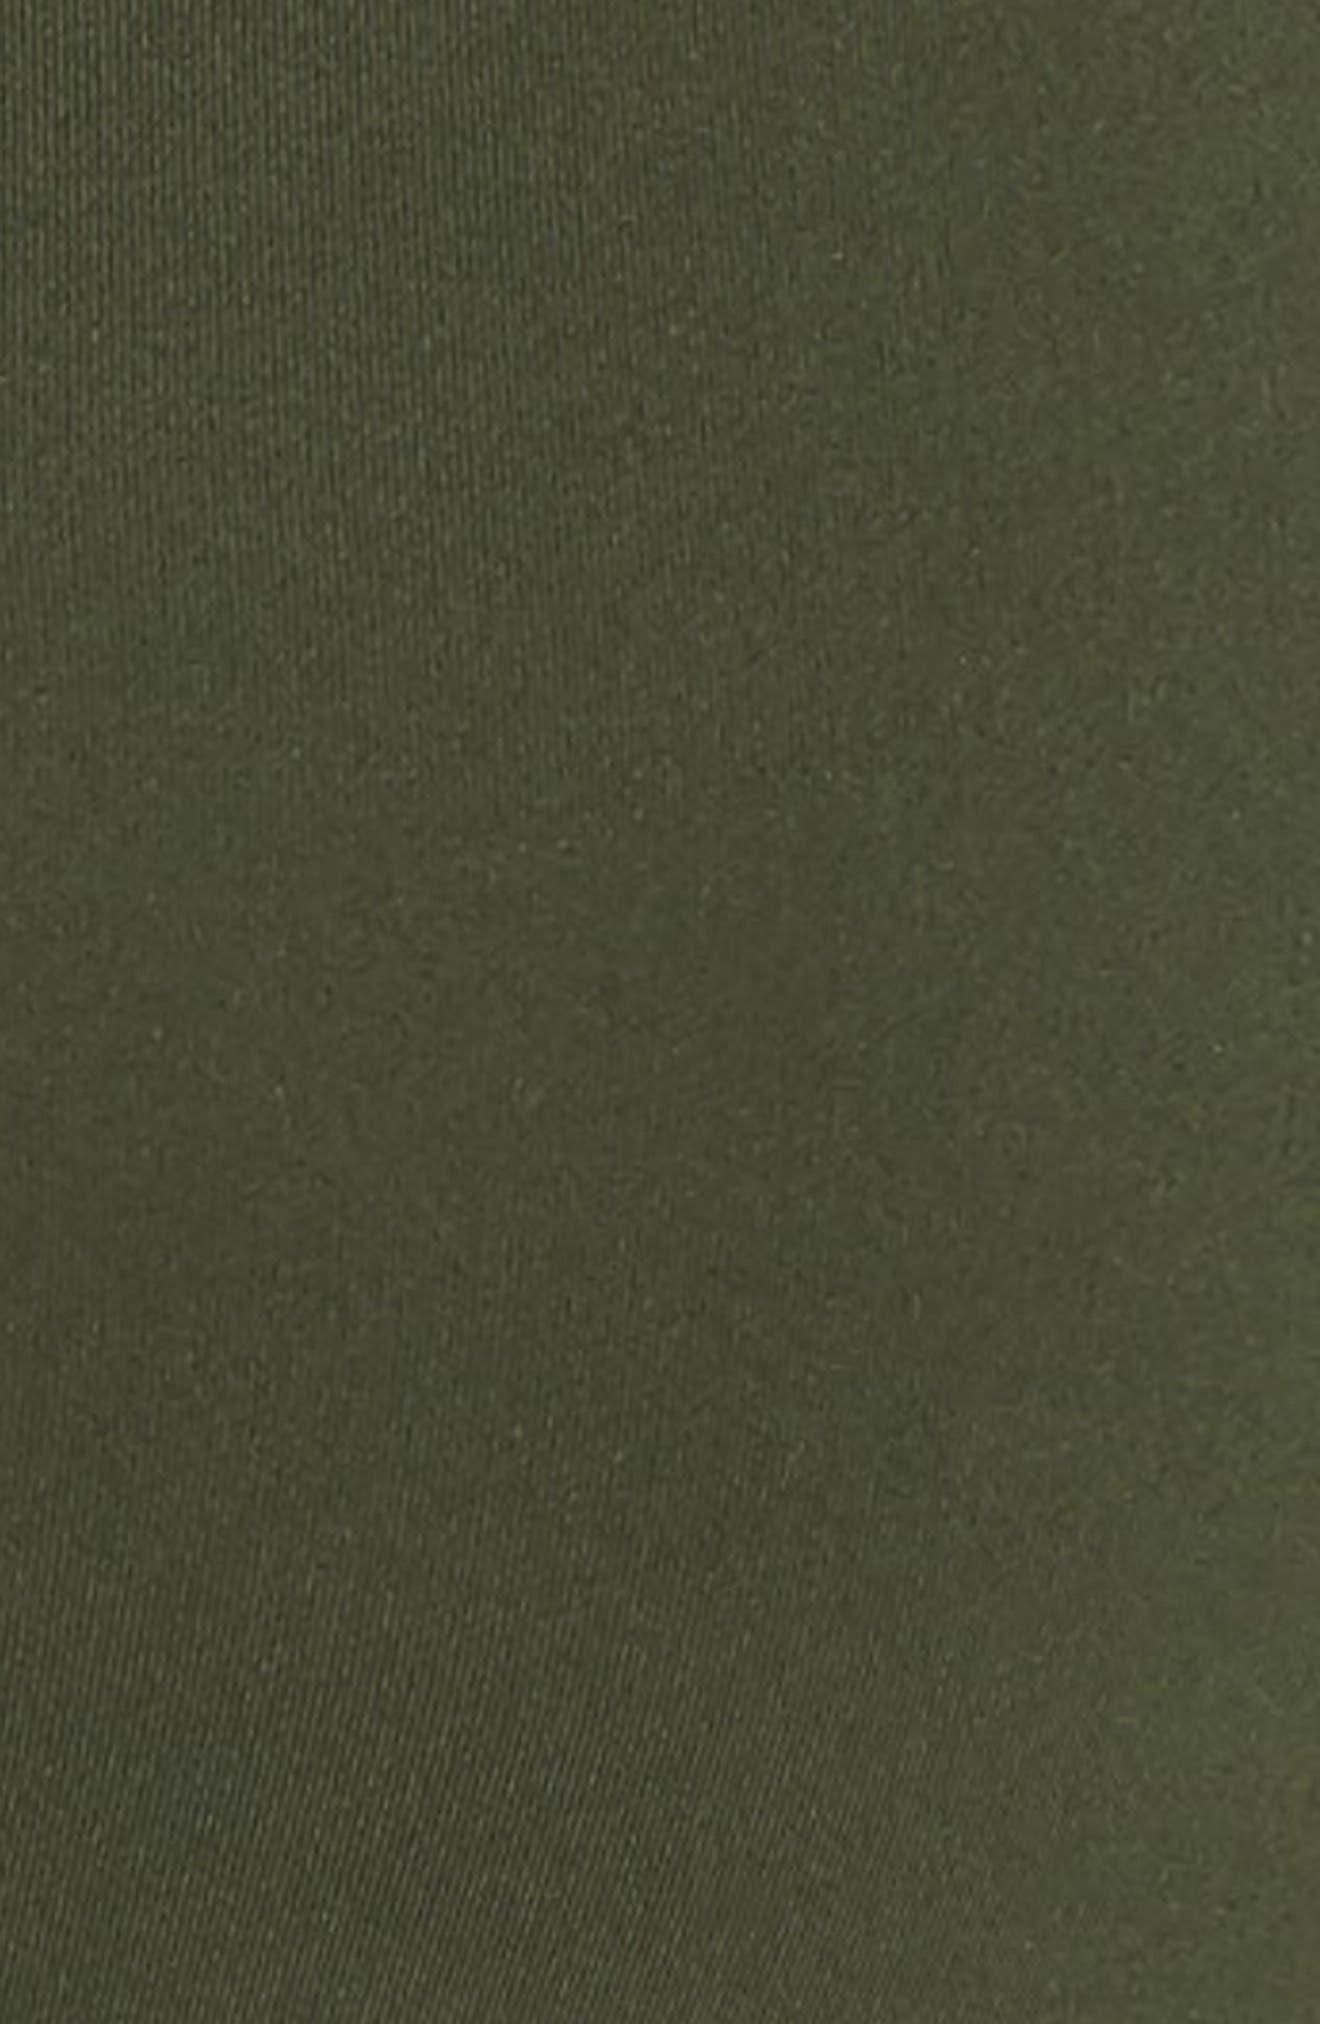 Mesh Lace-Up Sports Bra,                             Alternate thumbnail 7, color,                             310